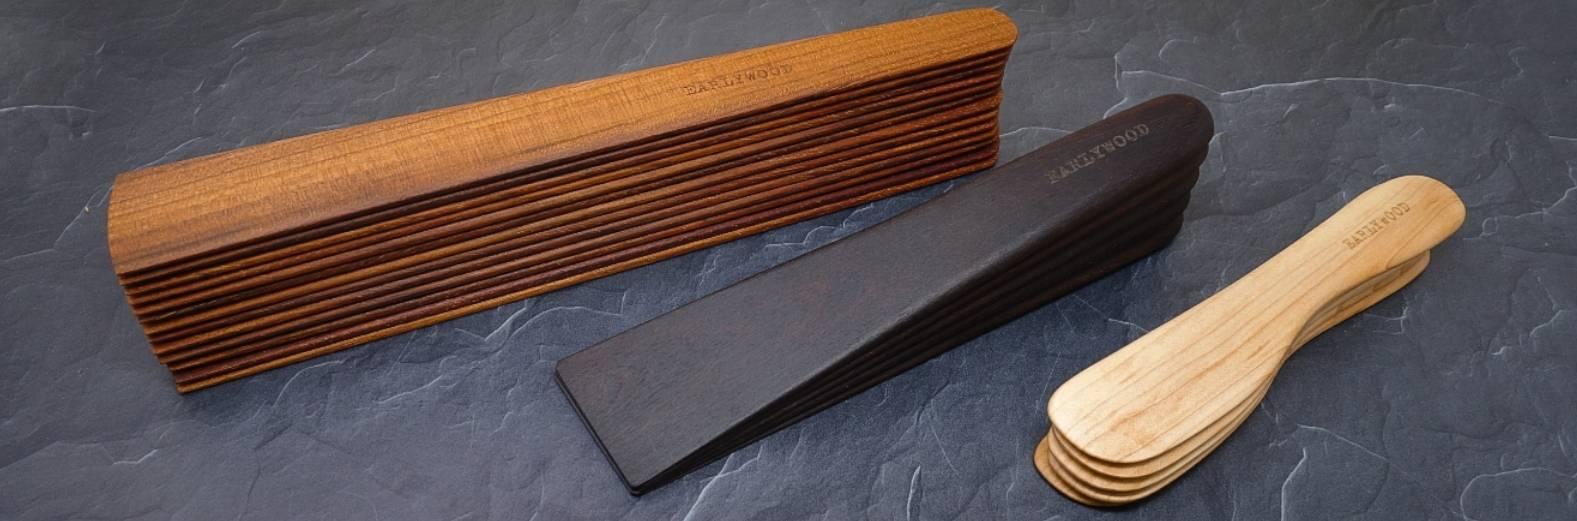 wholesale wooden kitchen utensils in bulk